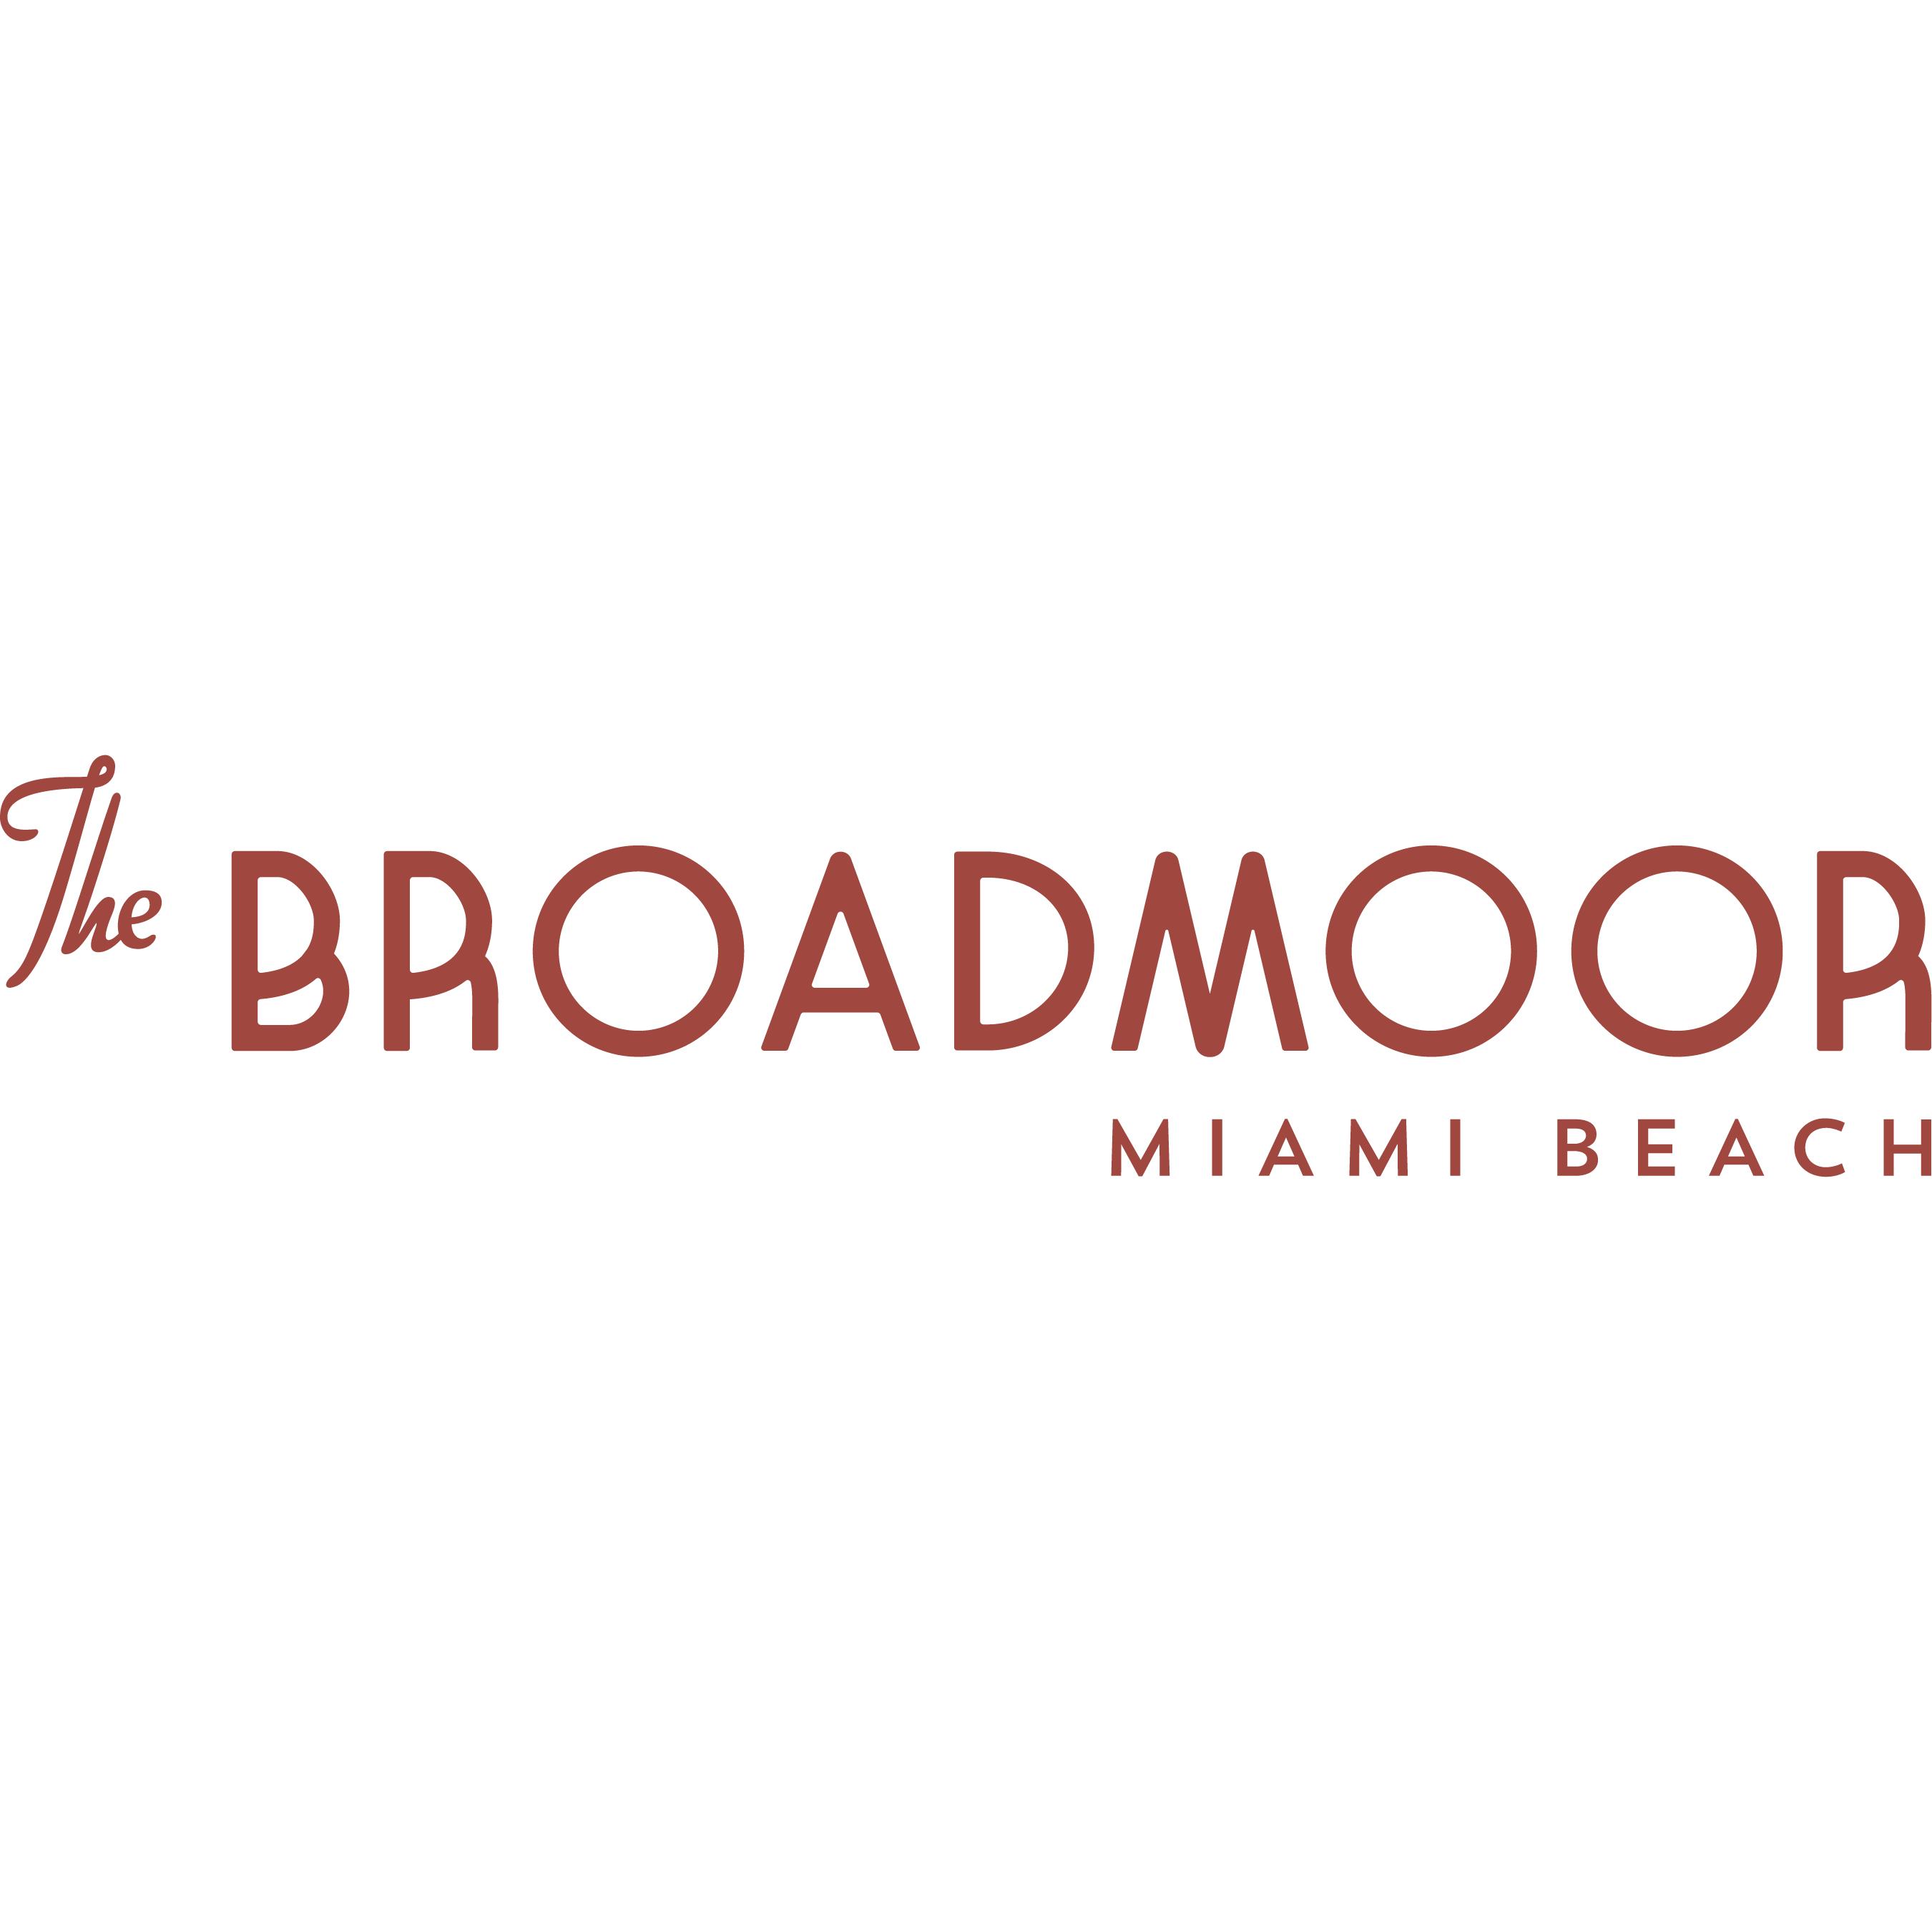 The Broadmoor Miami Beach